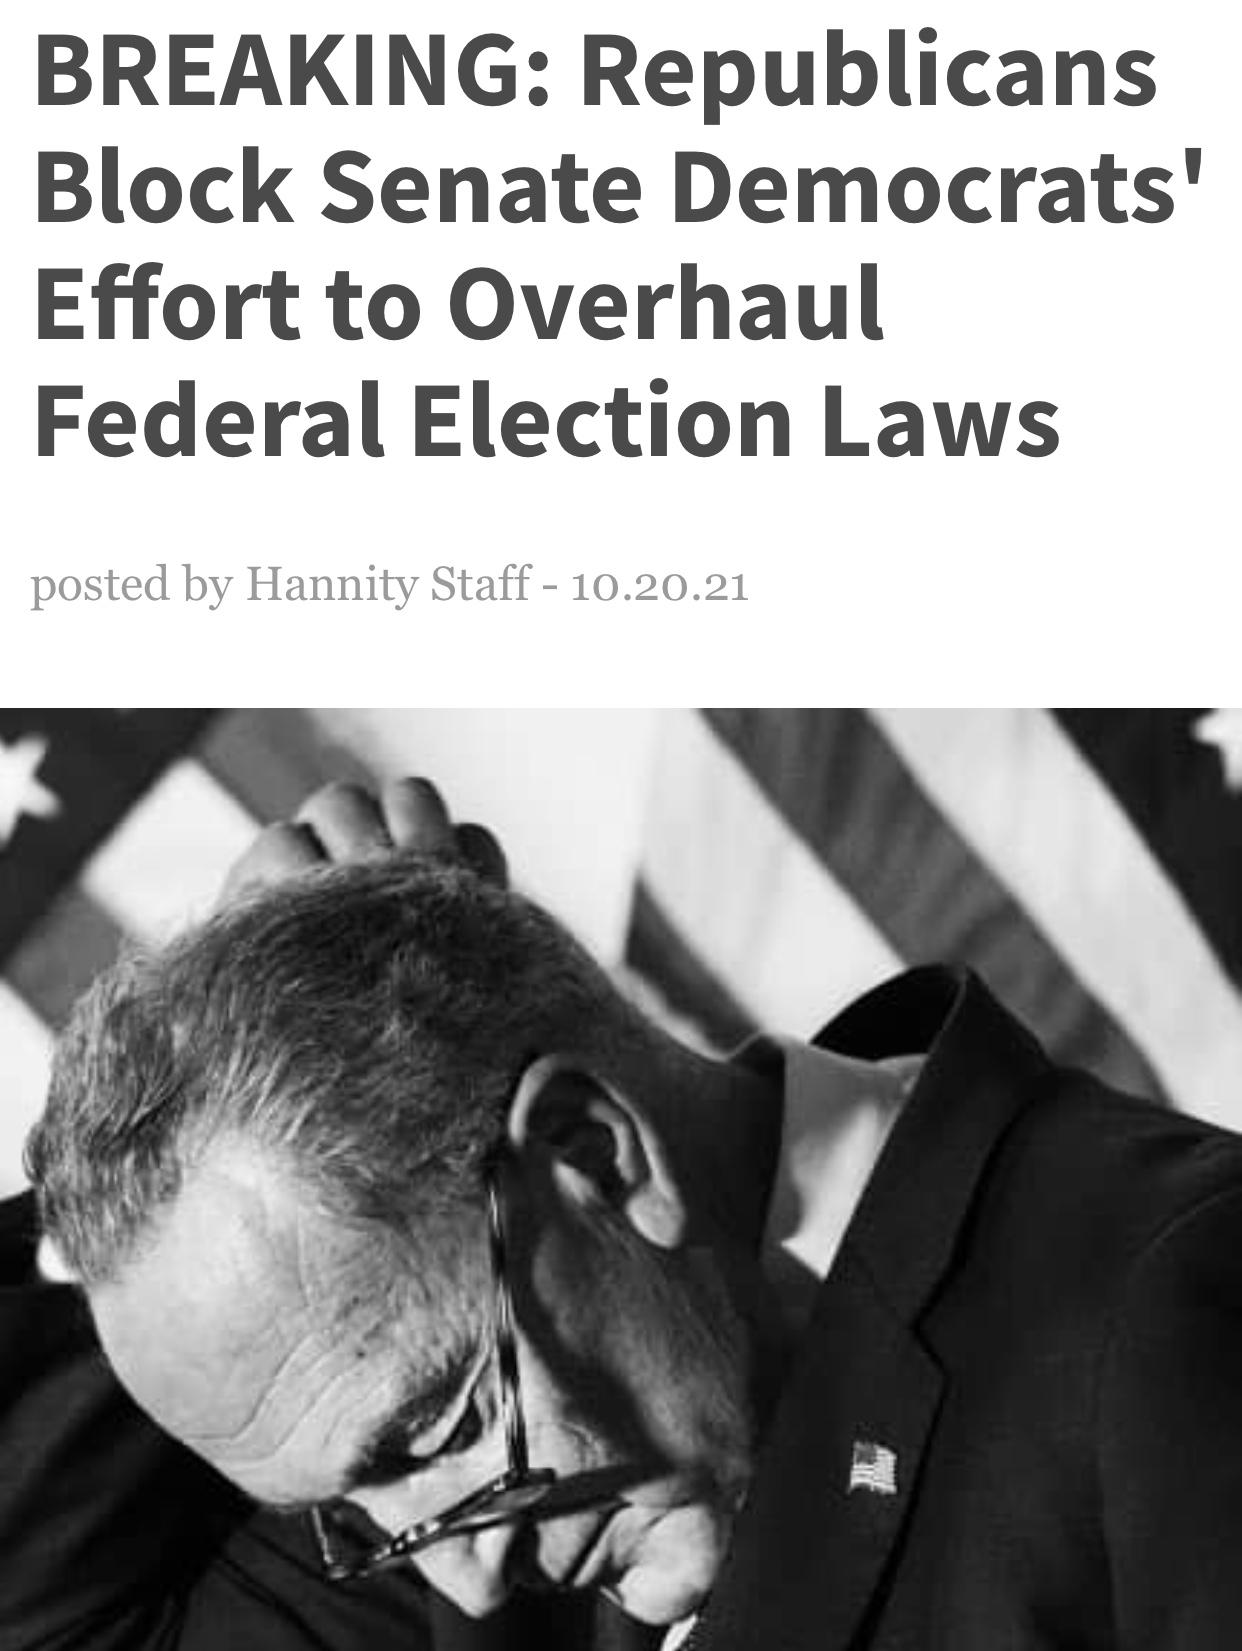 BREAKING: Republicans Block Senate Democrats' Effort to Overhaul Federal Election Laws